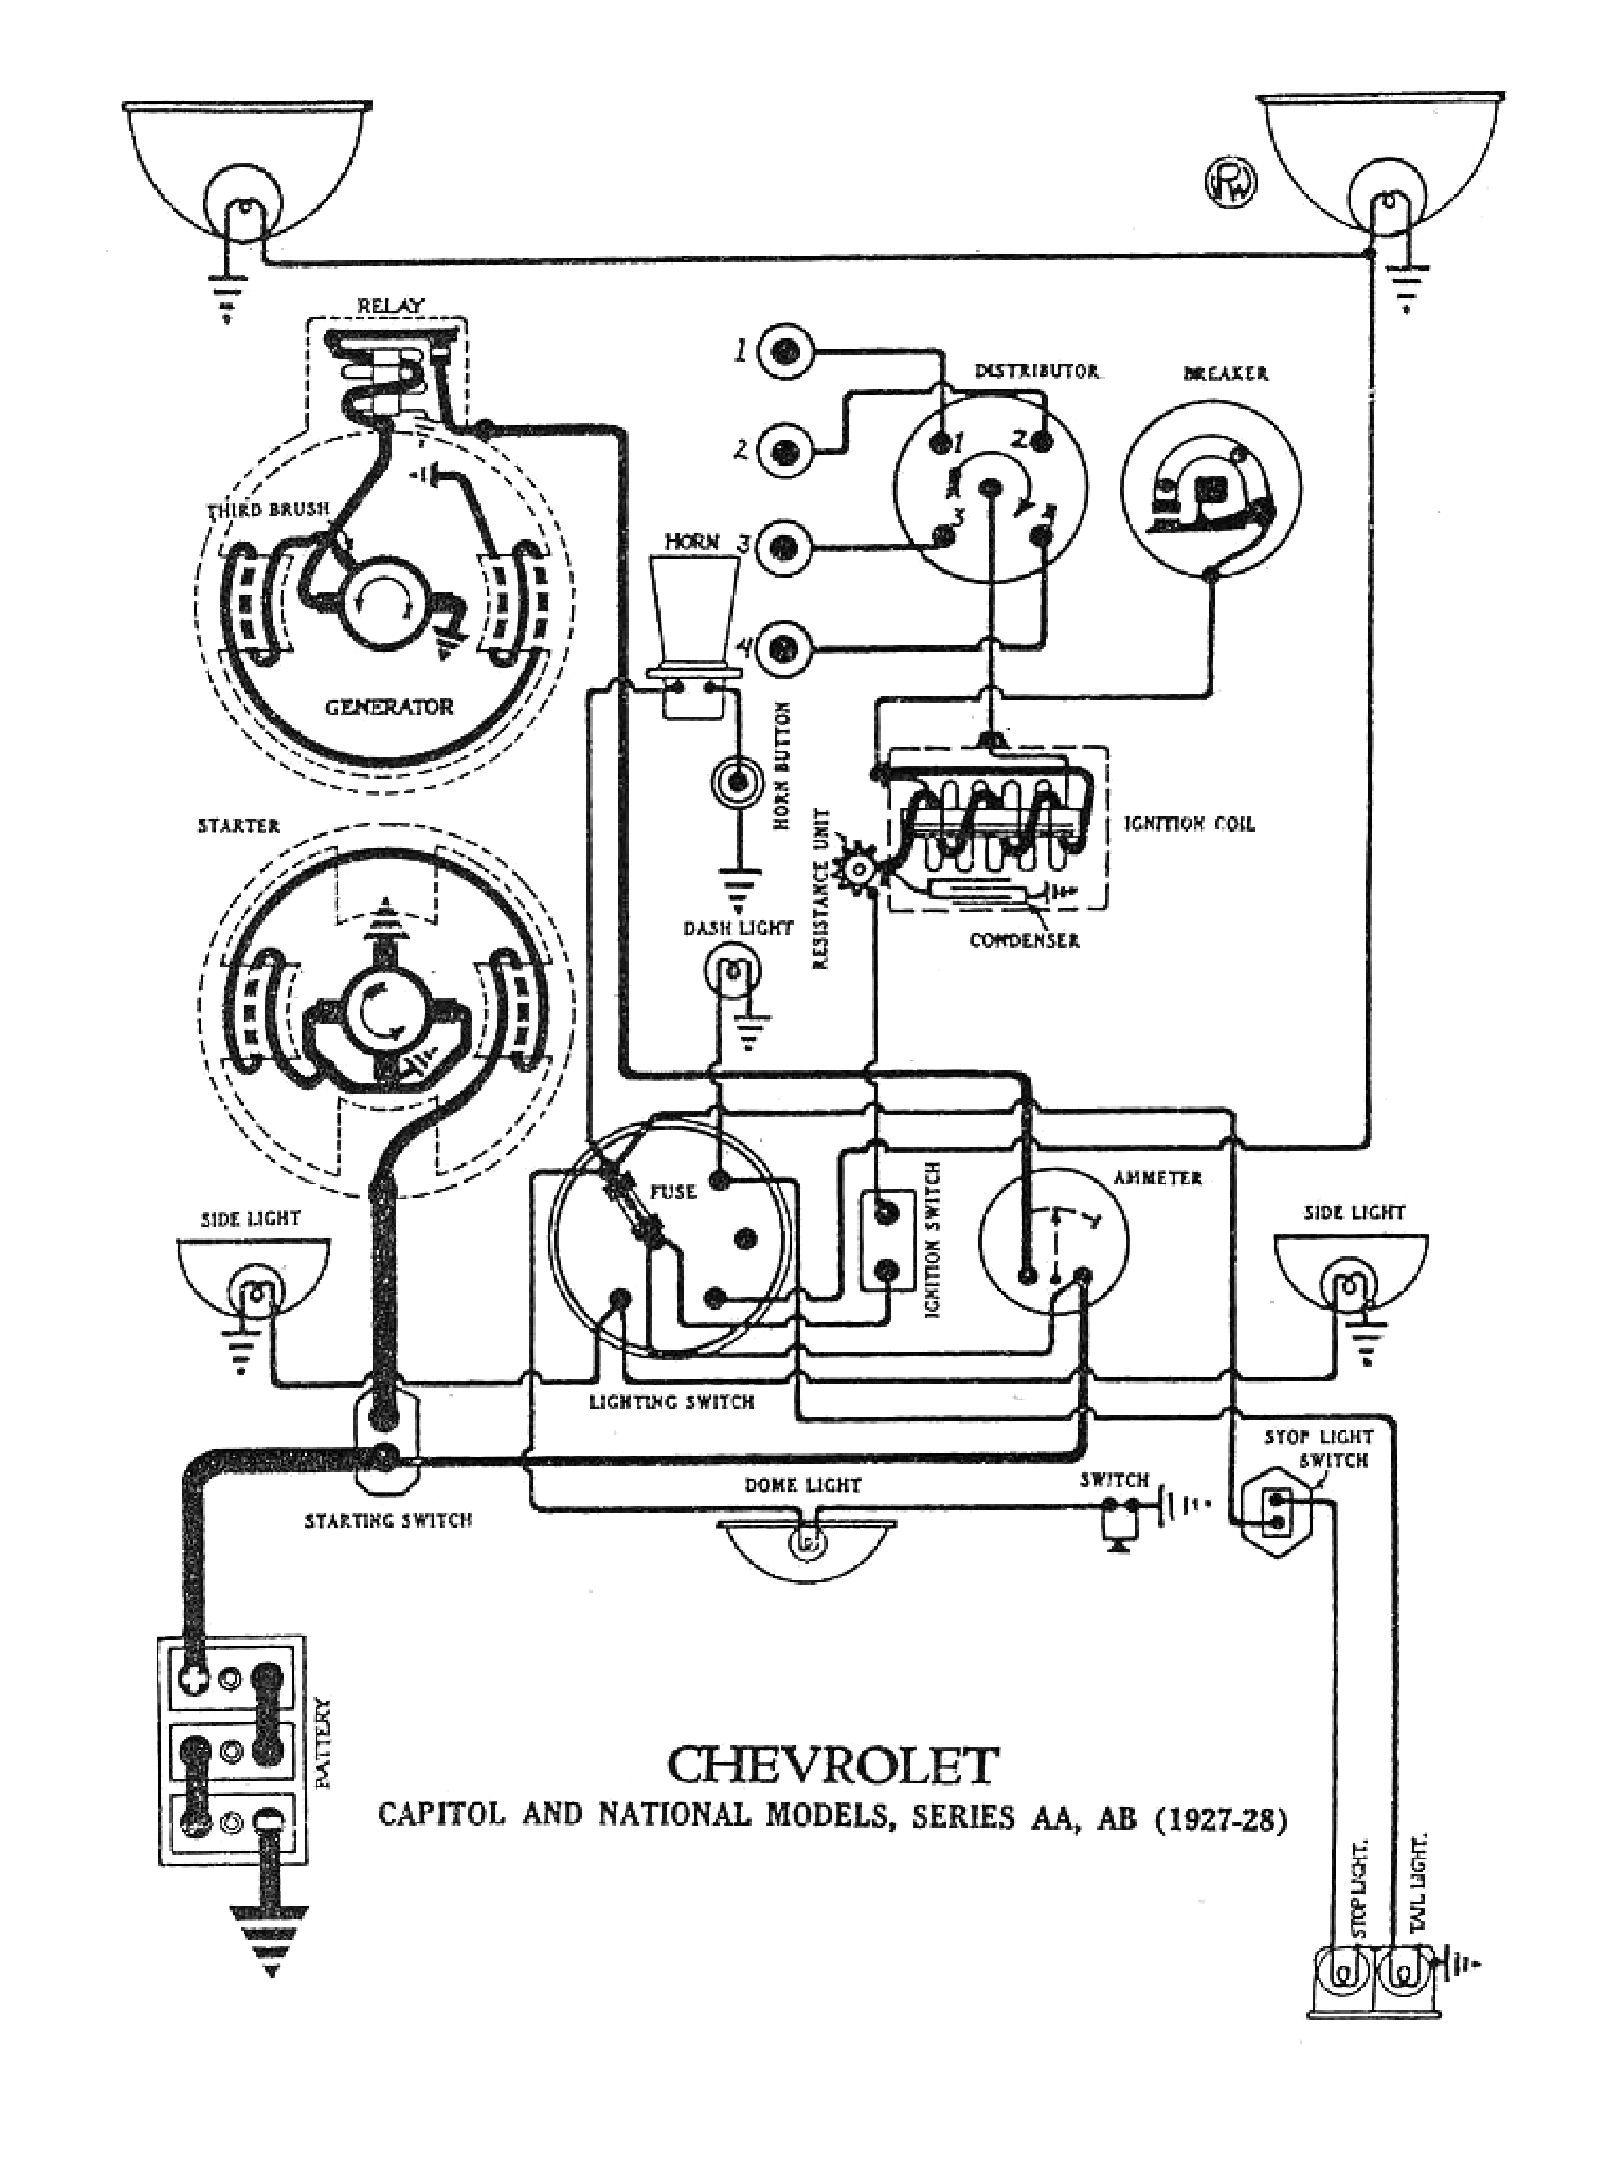 1930 Ford Model A Wiring Diagram - Wiring Diagram